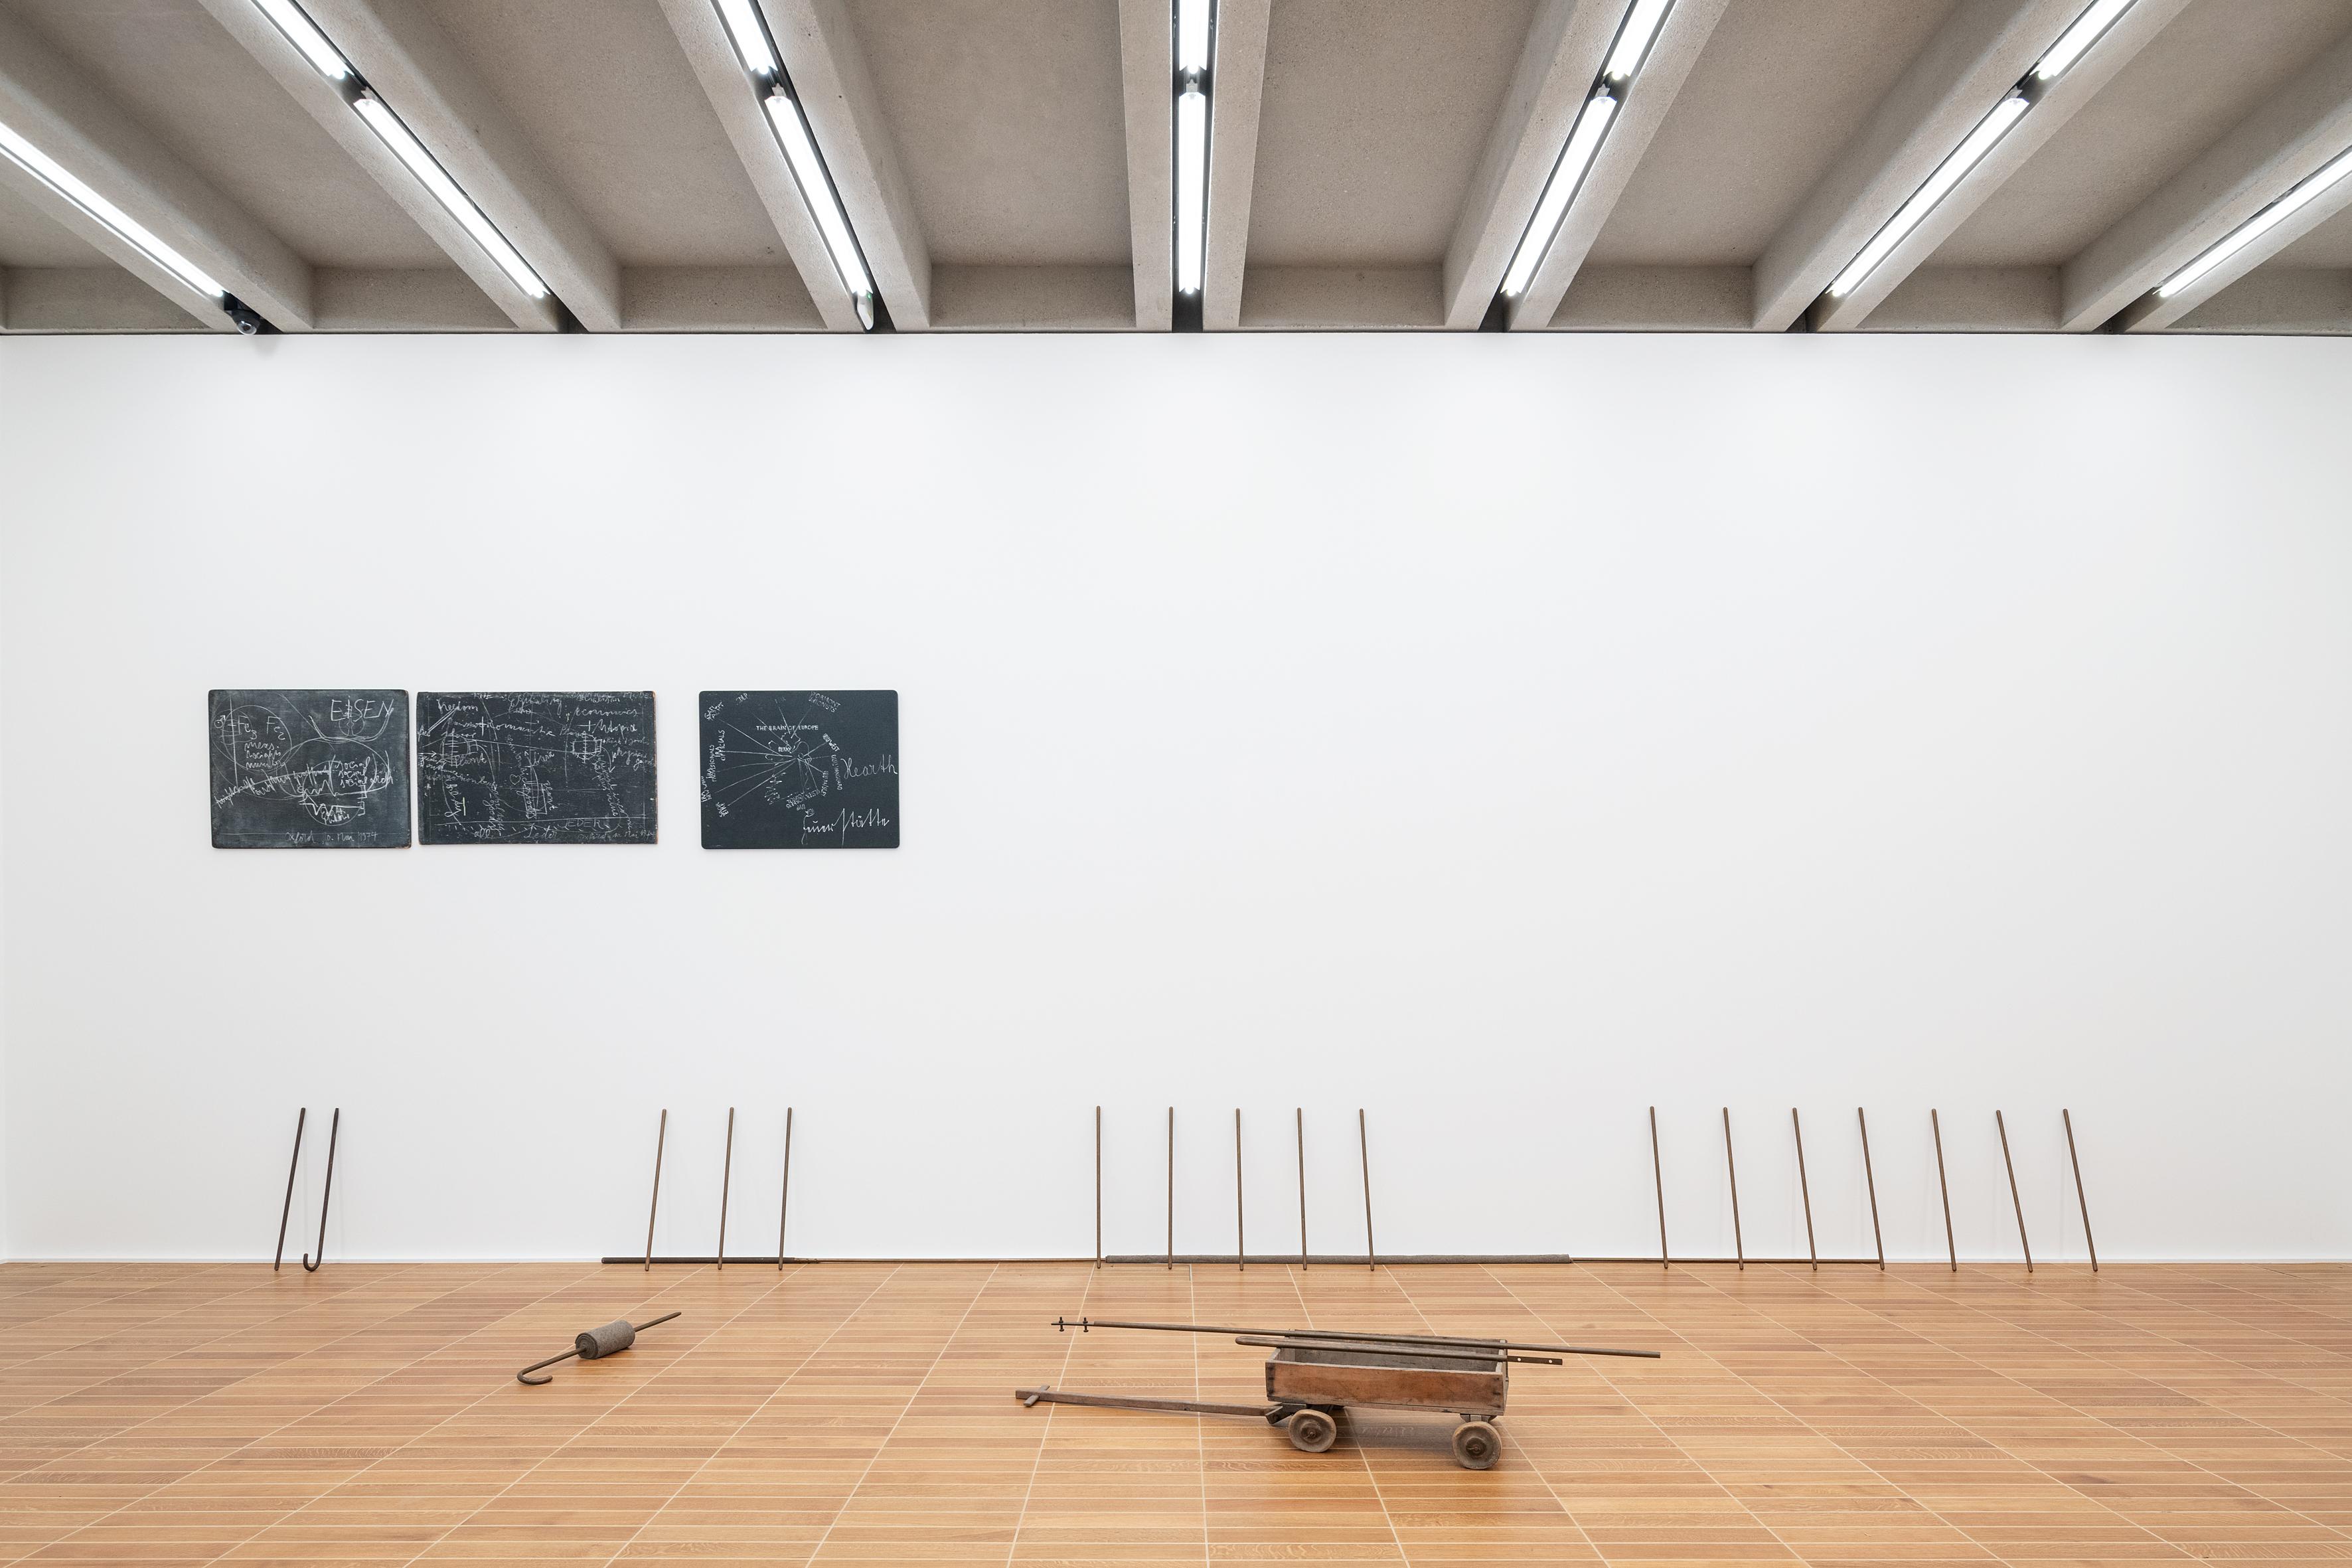 Joseph Beuys, THE HEARTH (Feuerstätte), 1968-1974, Kunstmuseum Basel, ©2021, ProLitteris, Zurich, Foto: Jonas Hänggi